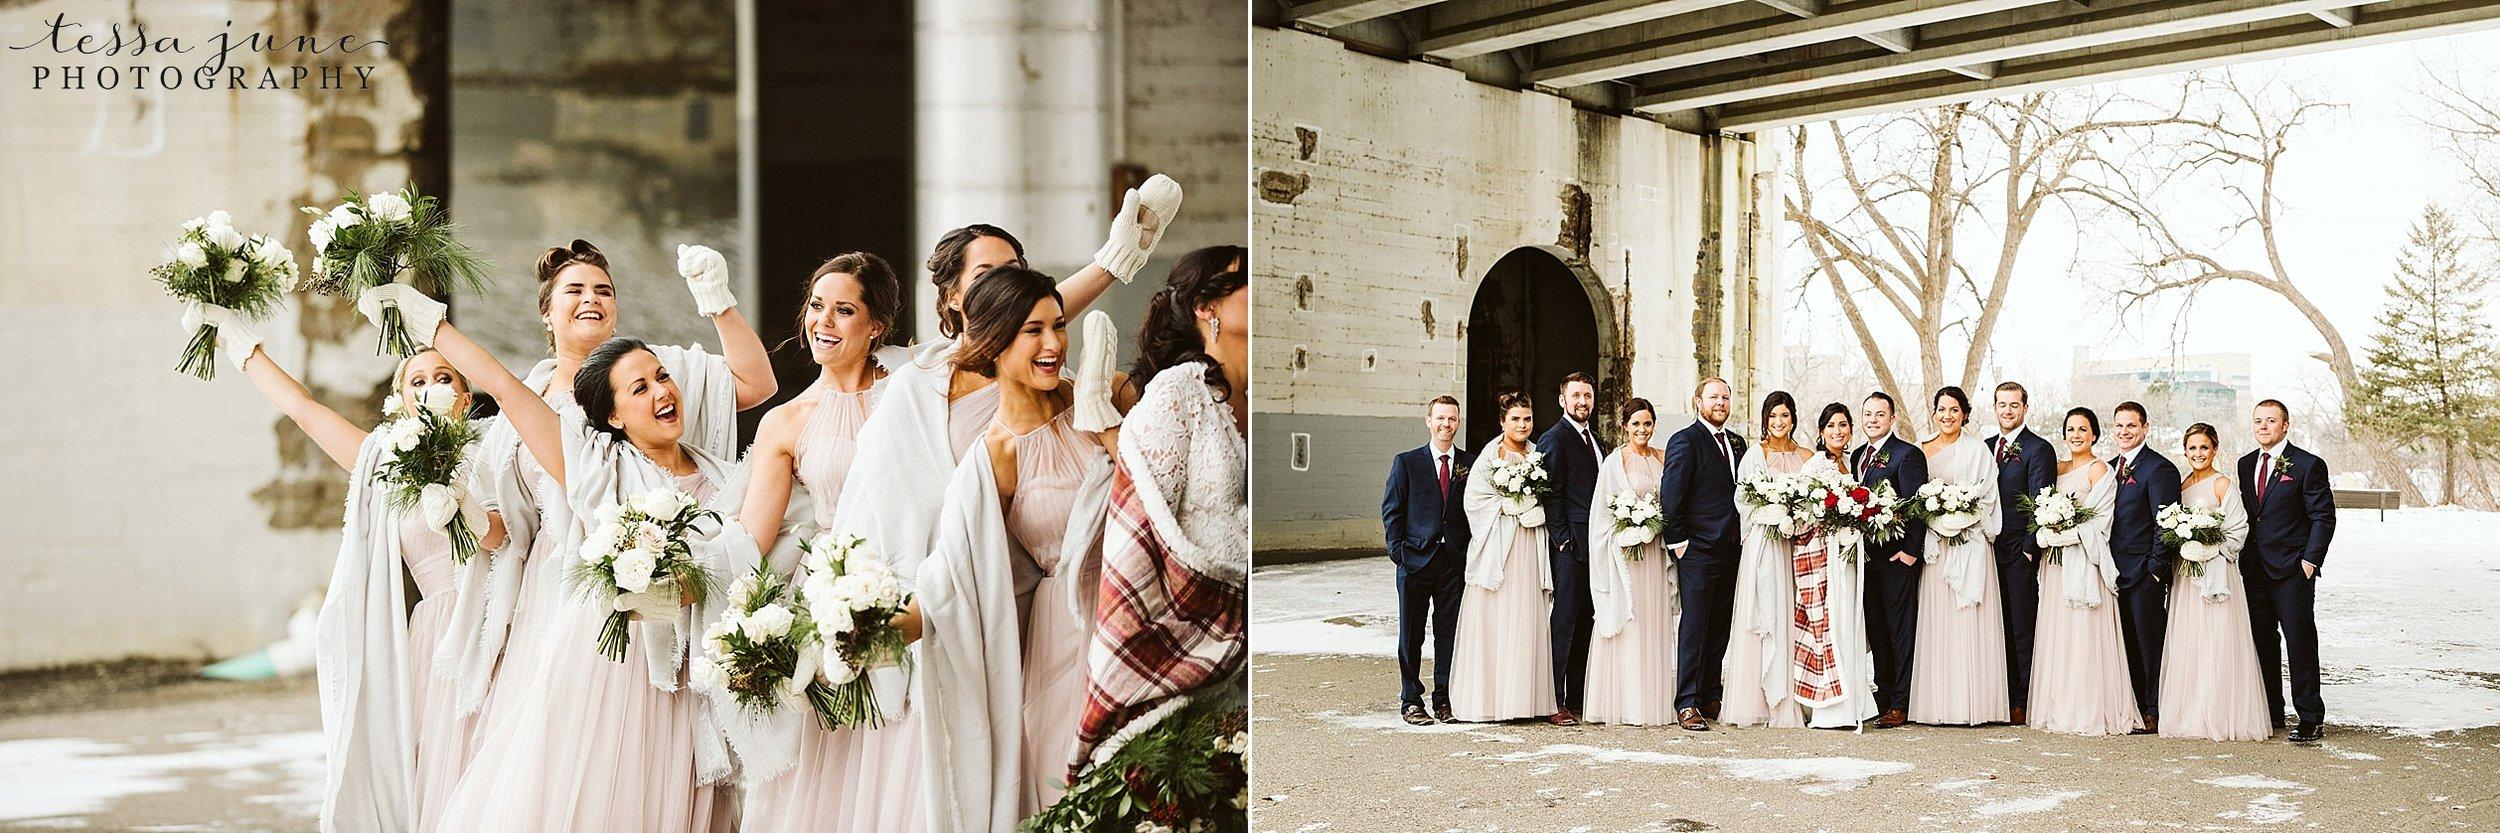 minneapolis-event-center-winter-romantic-snow-wedding-december-122.jpg